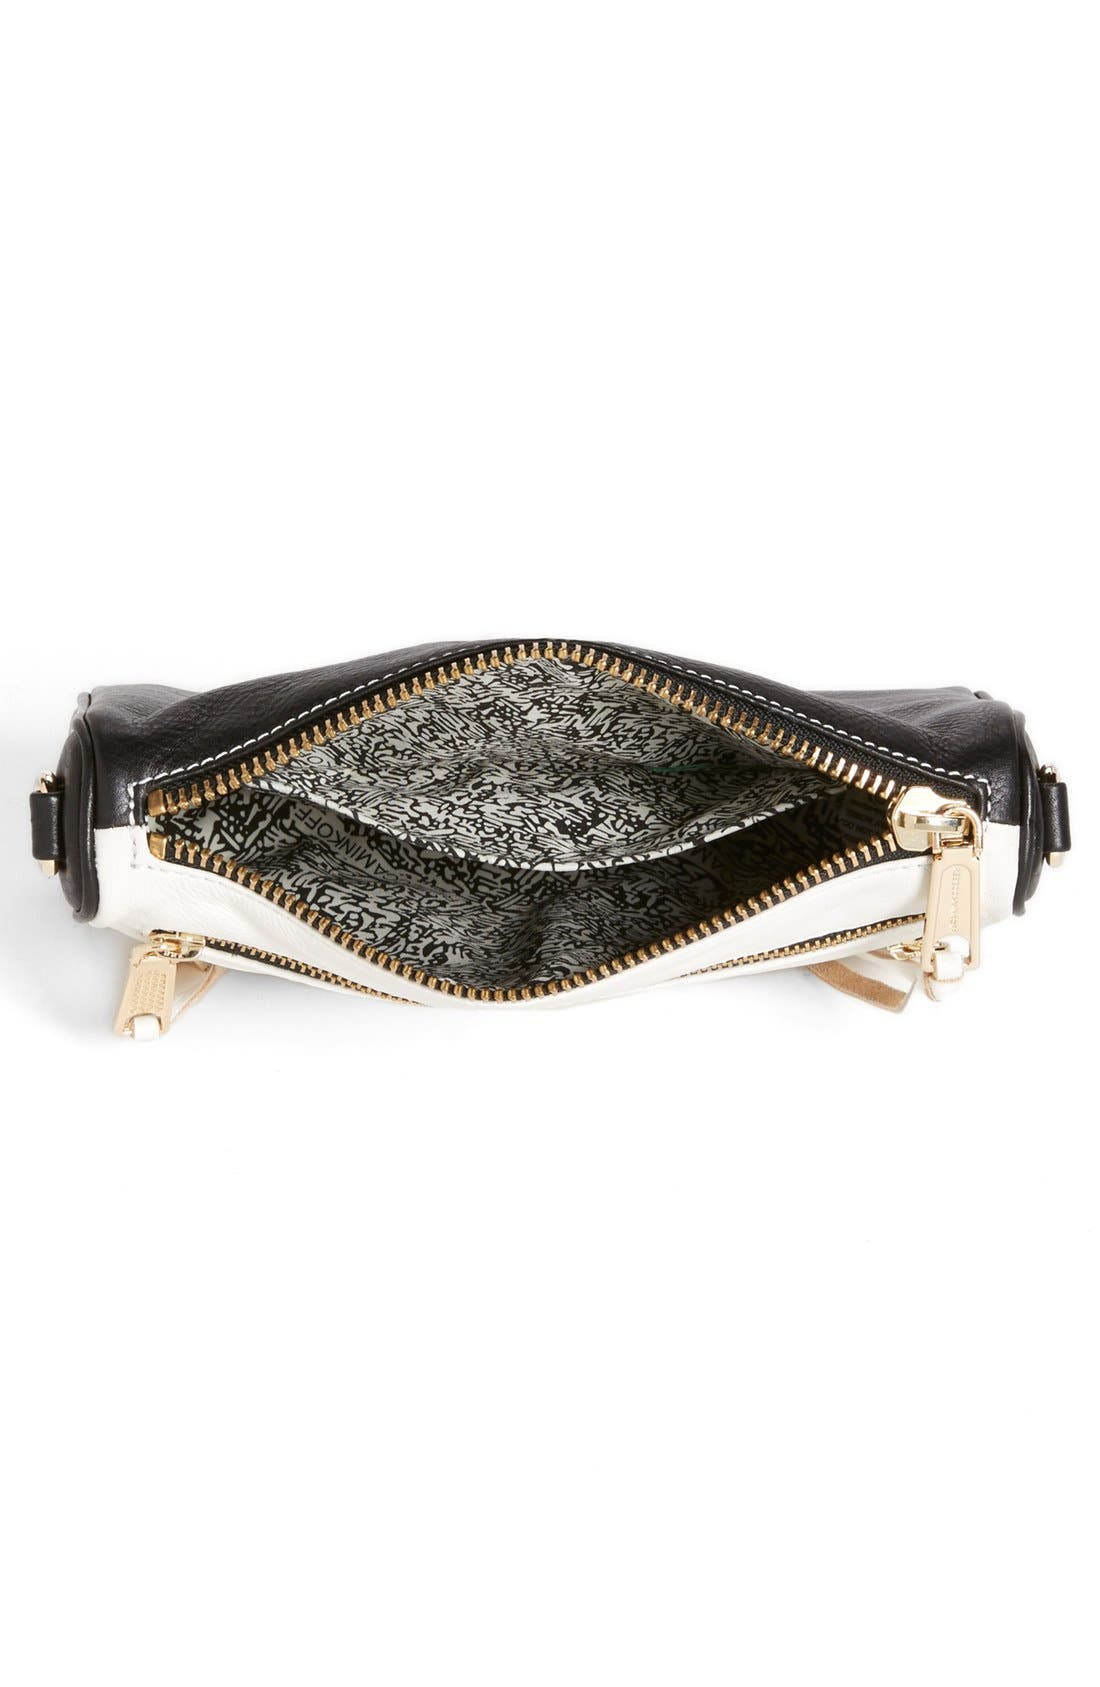 Alternate Image 3  - Rebecca Minkoff '5 Zip - Mini' Two-Tone Leather Crossbody Bag